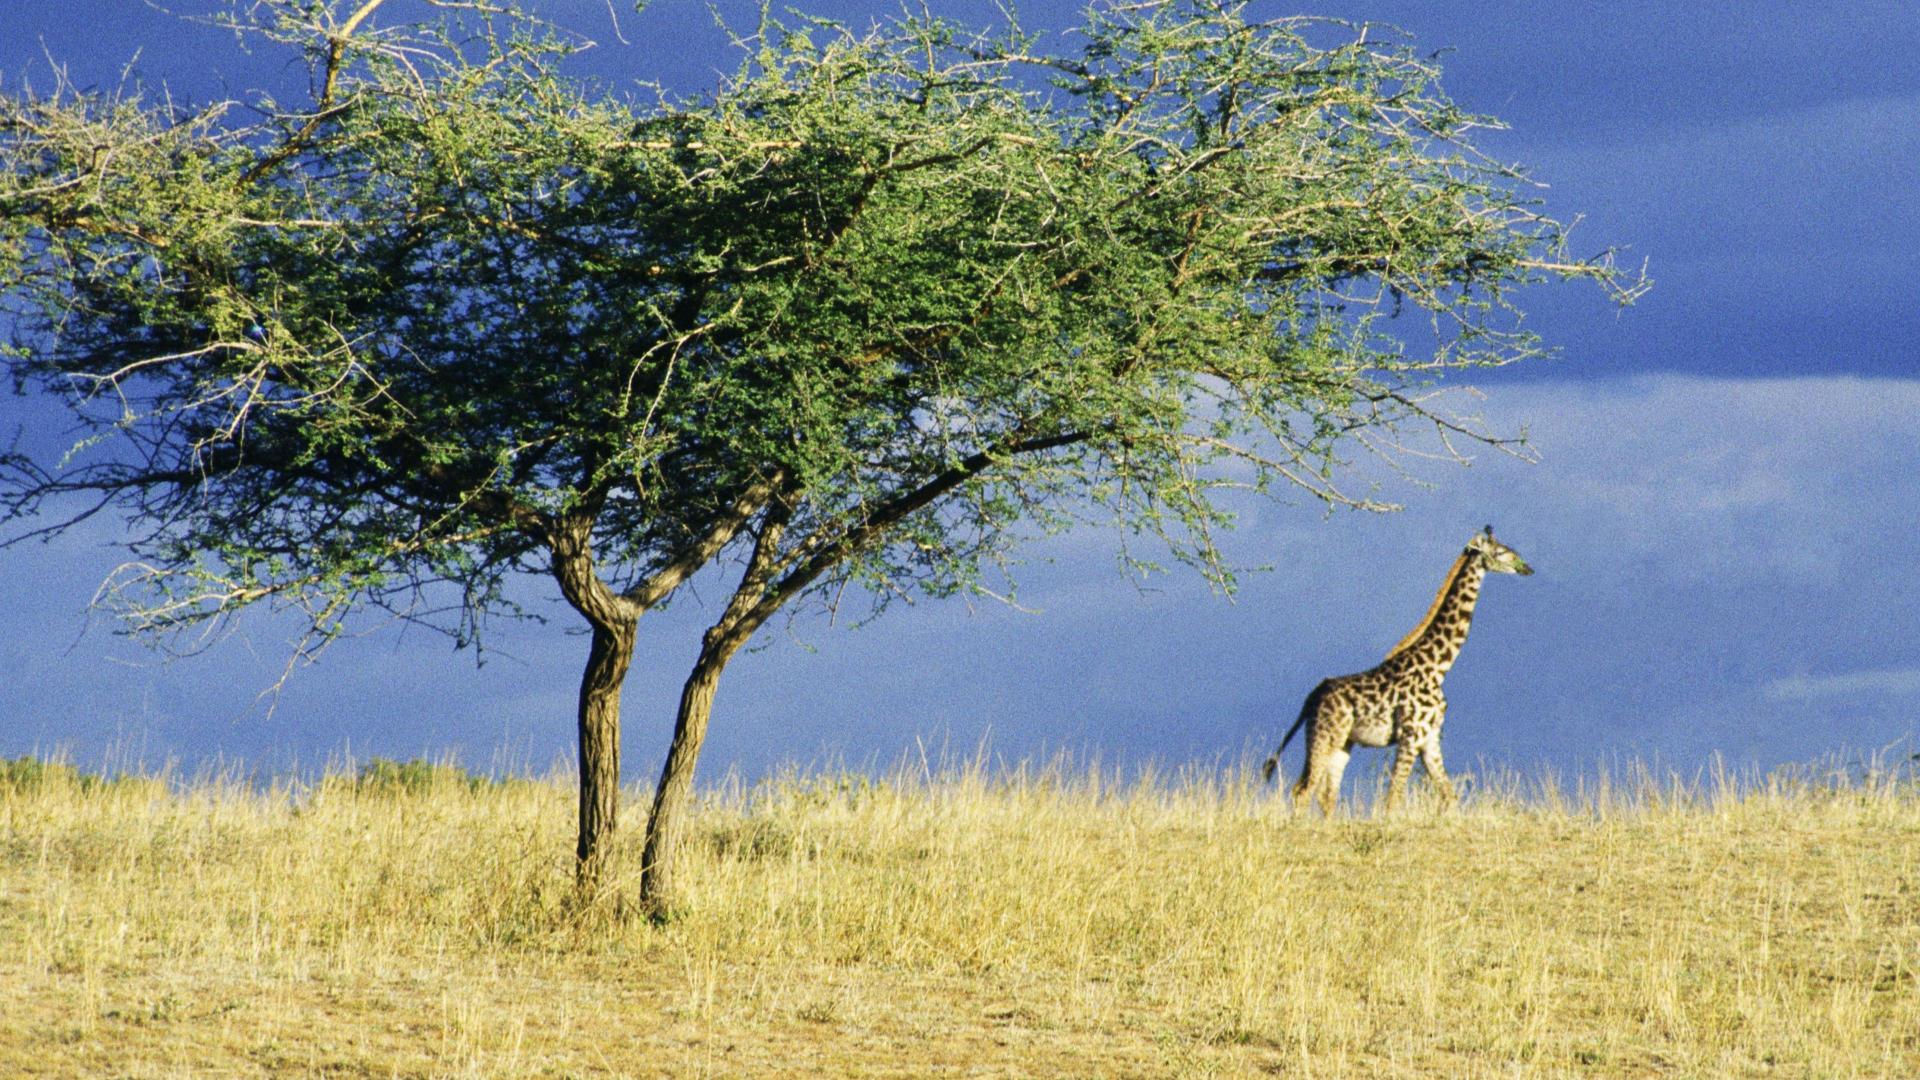 national park serengeti wallpaper